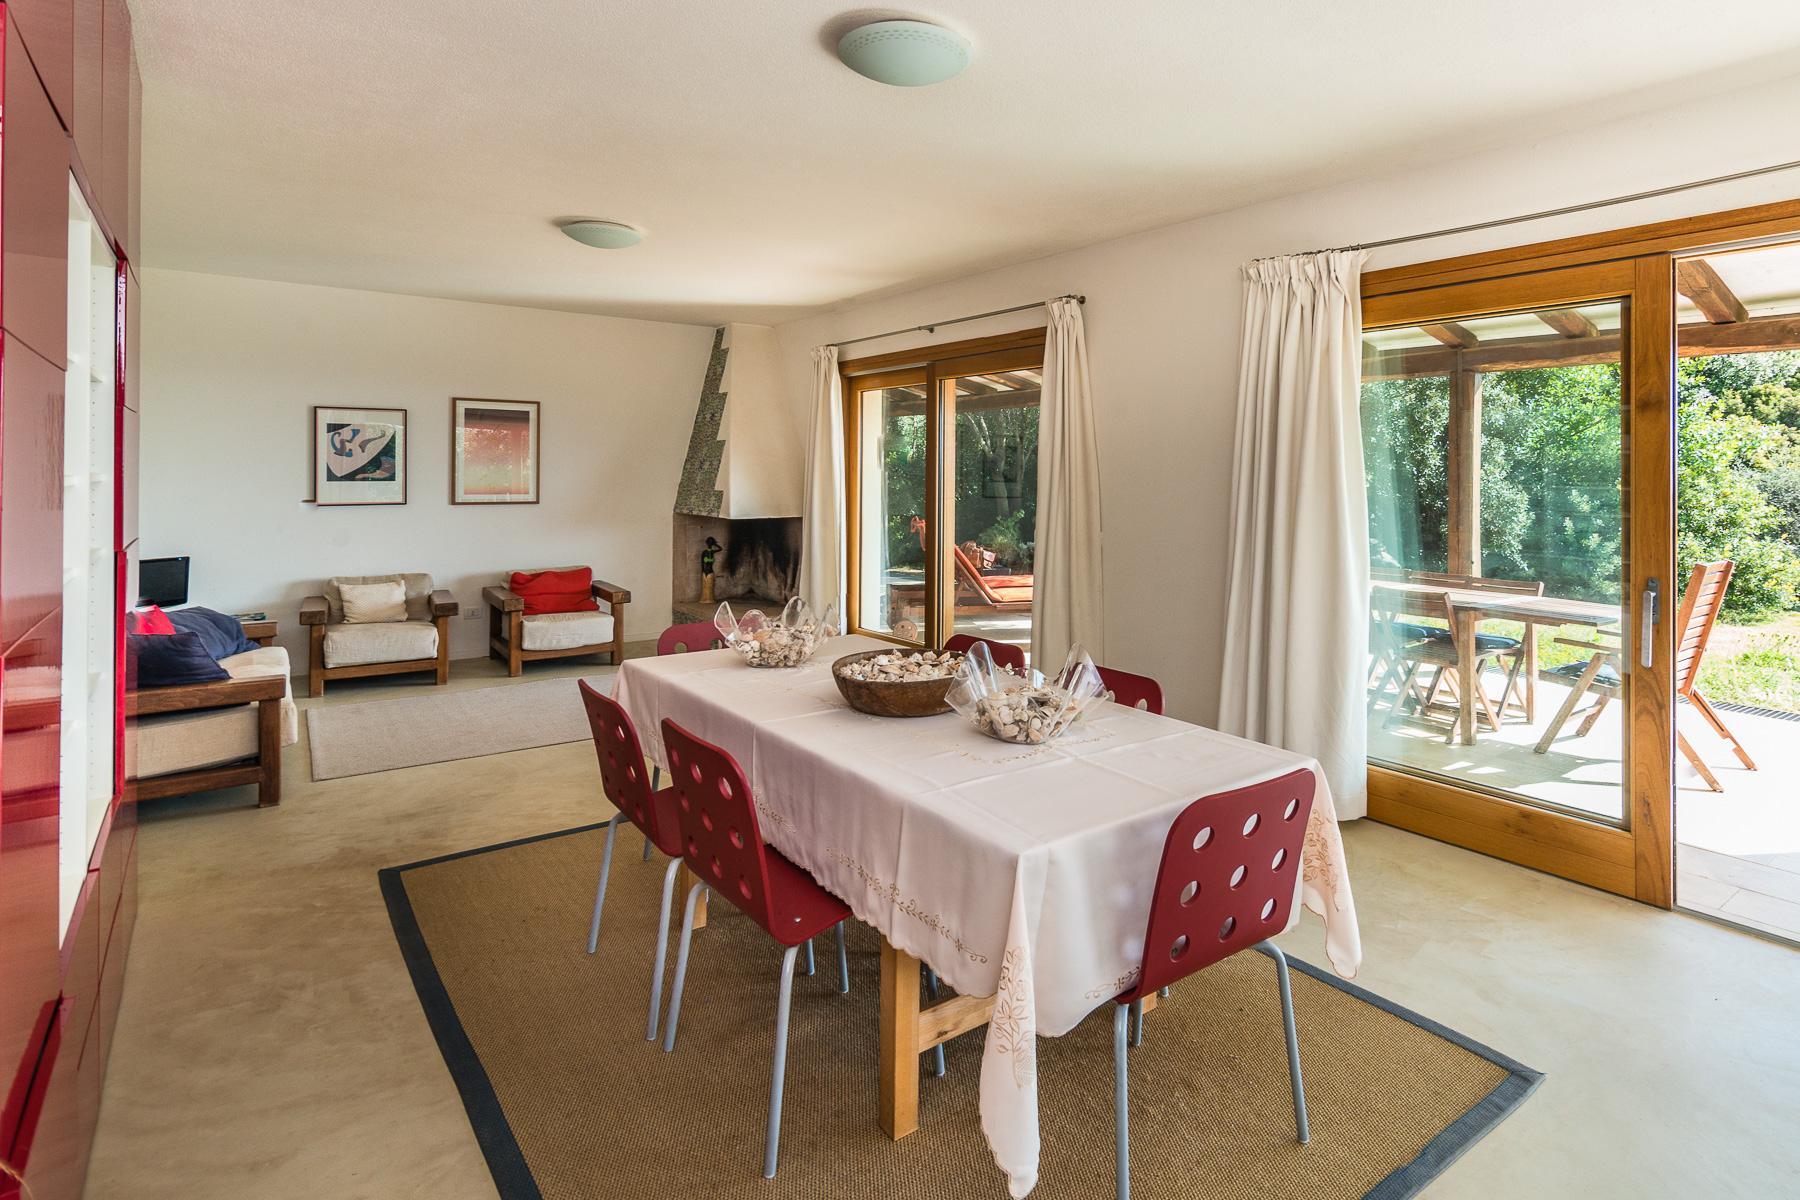 Golfo Aranci Sos Aranzos Wonderfull Villa with direct access to the beach - 4